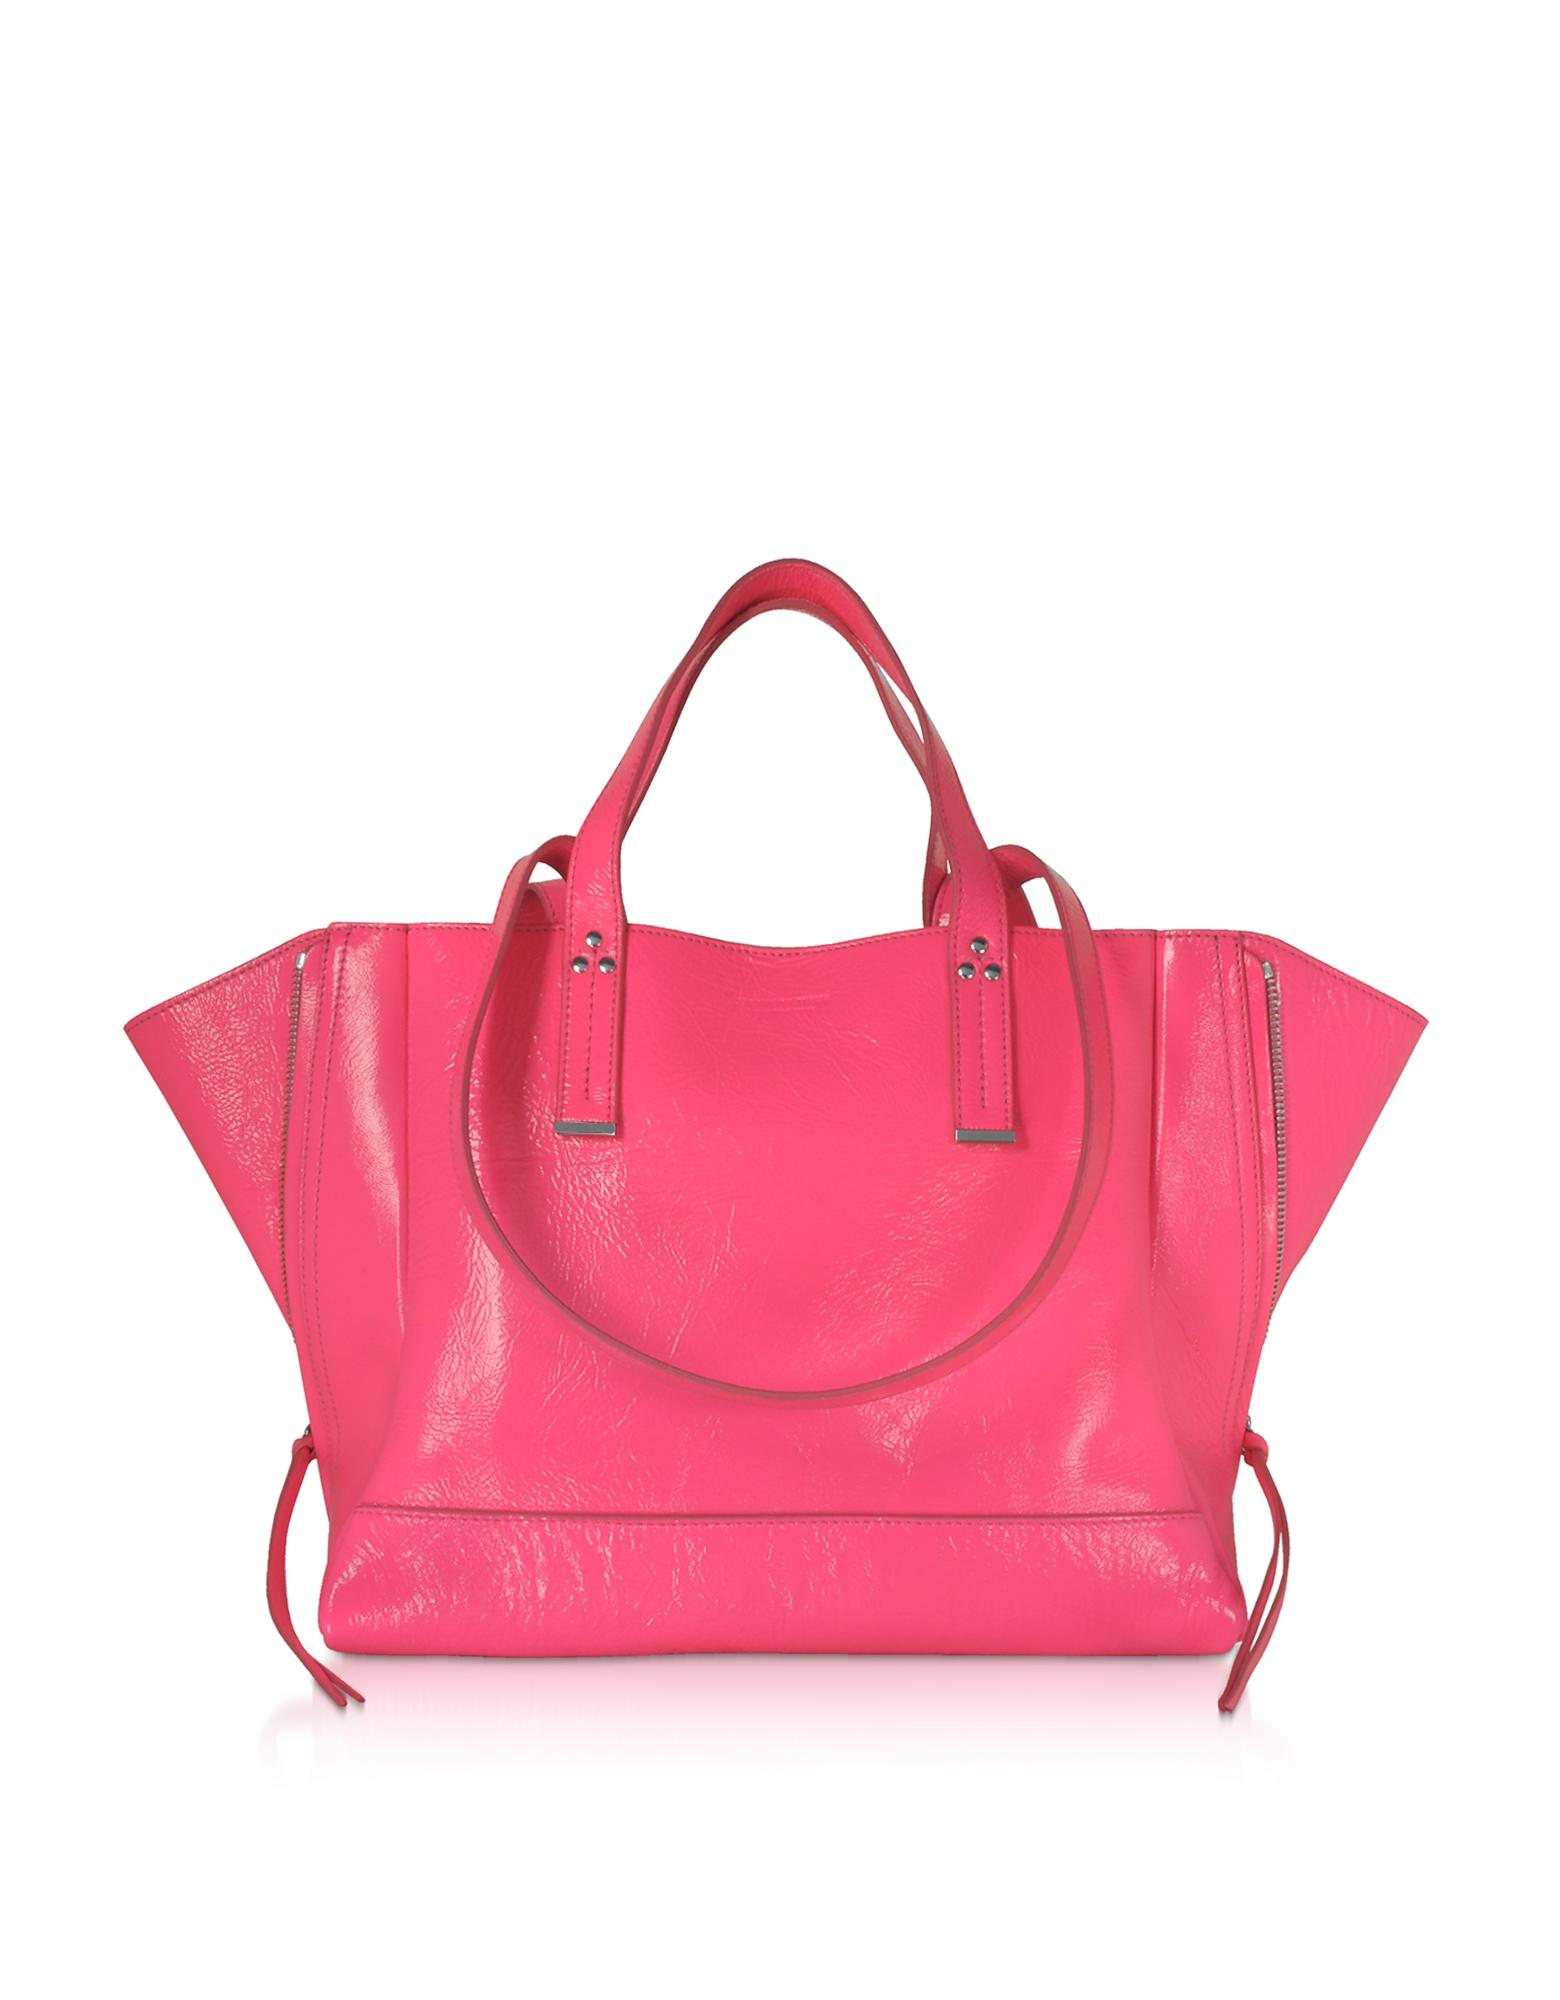 Georges M Croco Fuchsia Glossy Leather Tote Bag